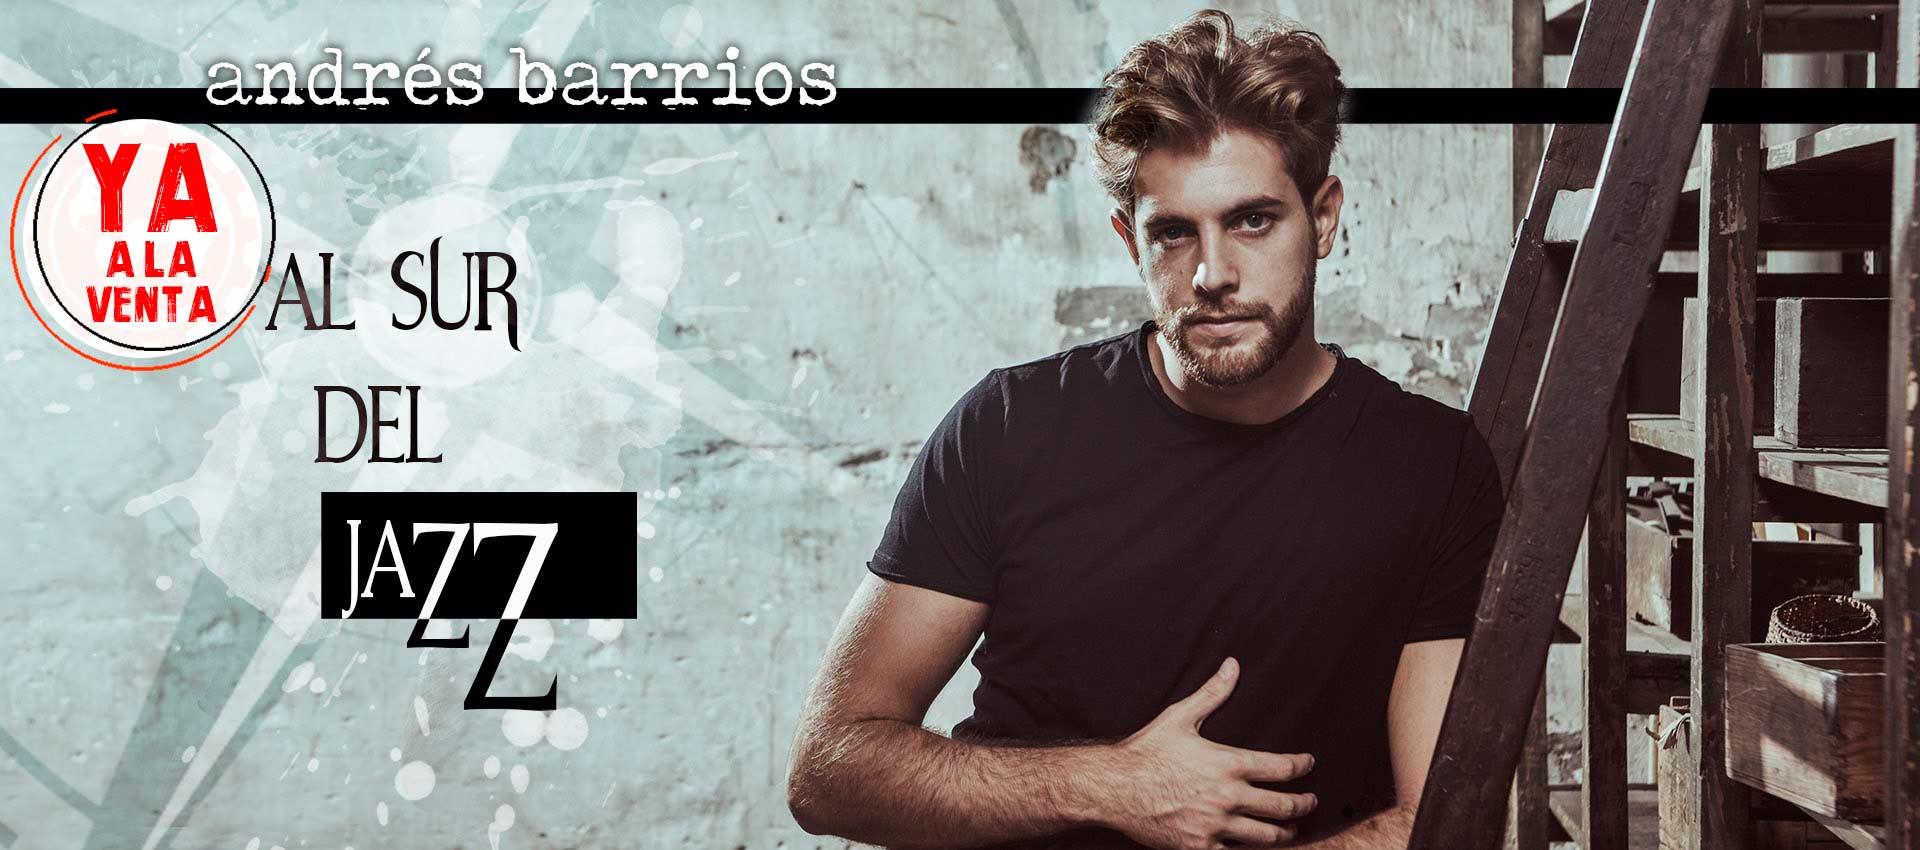 Andrés Barrios Al Sur de Jazz